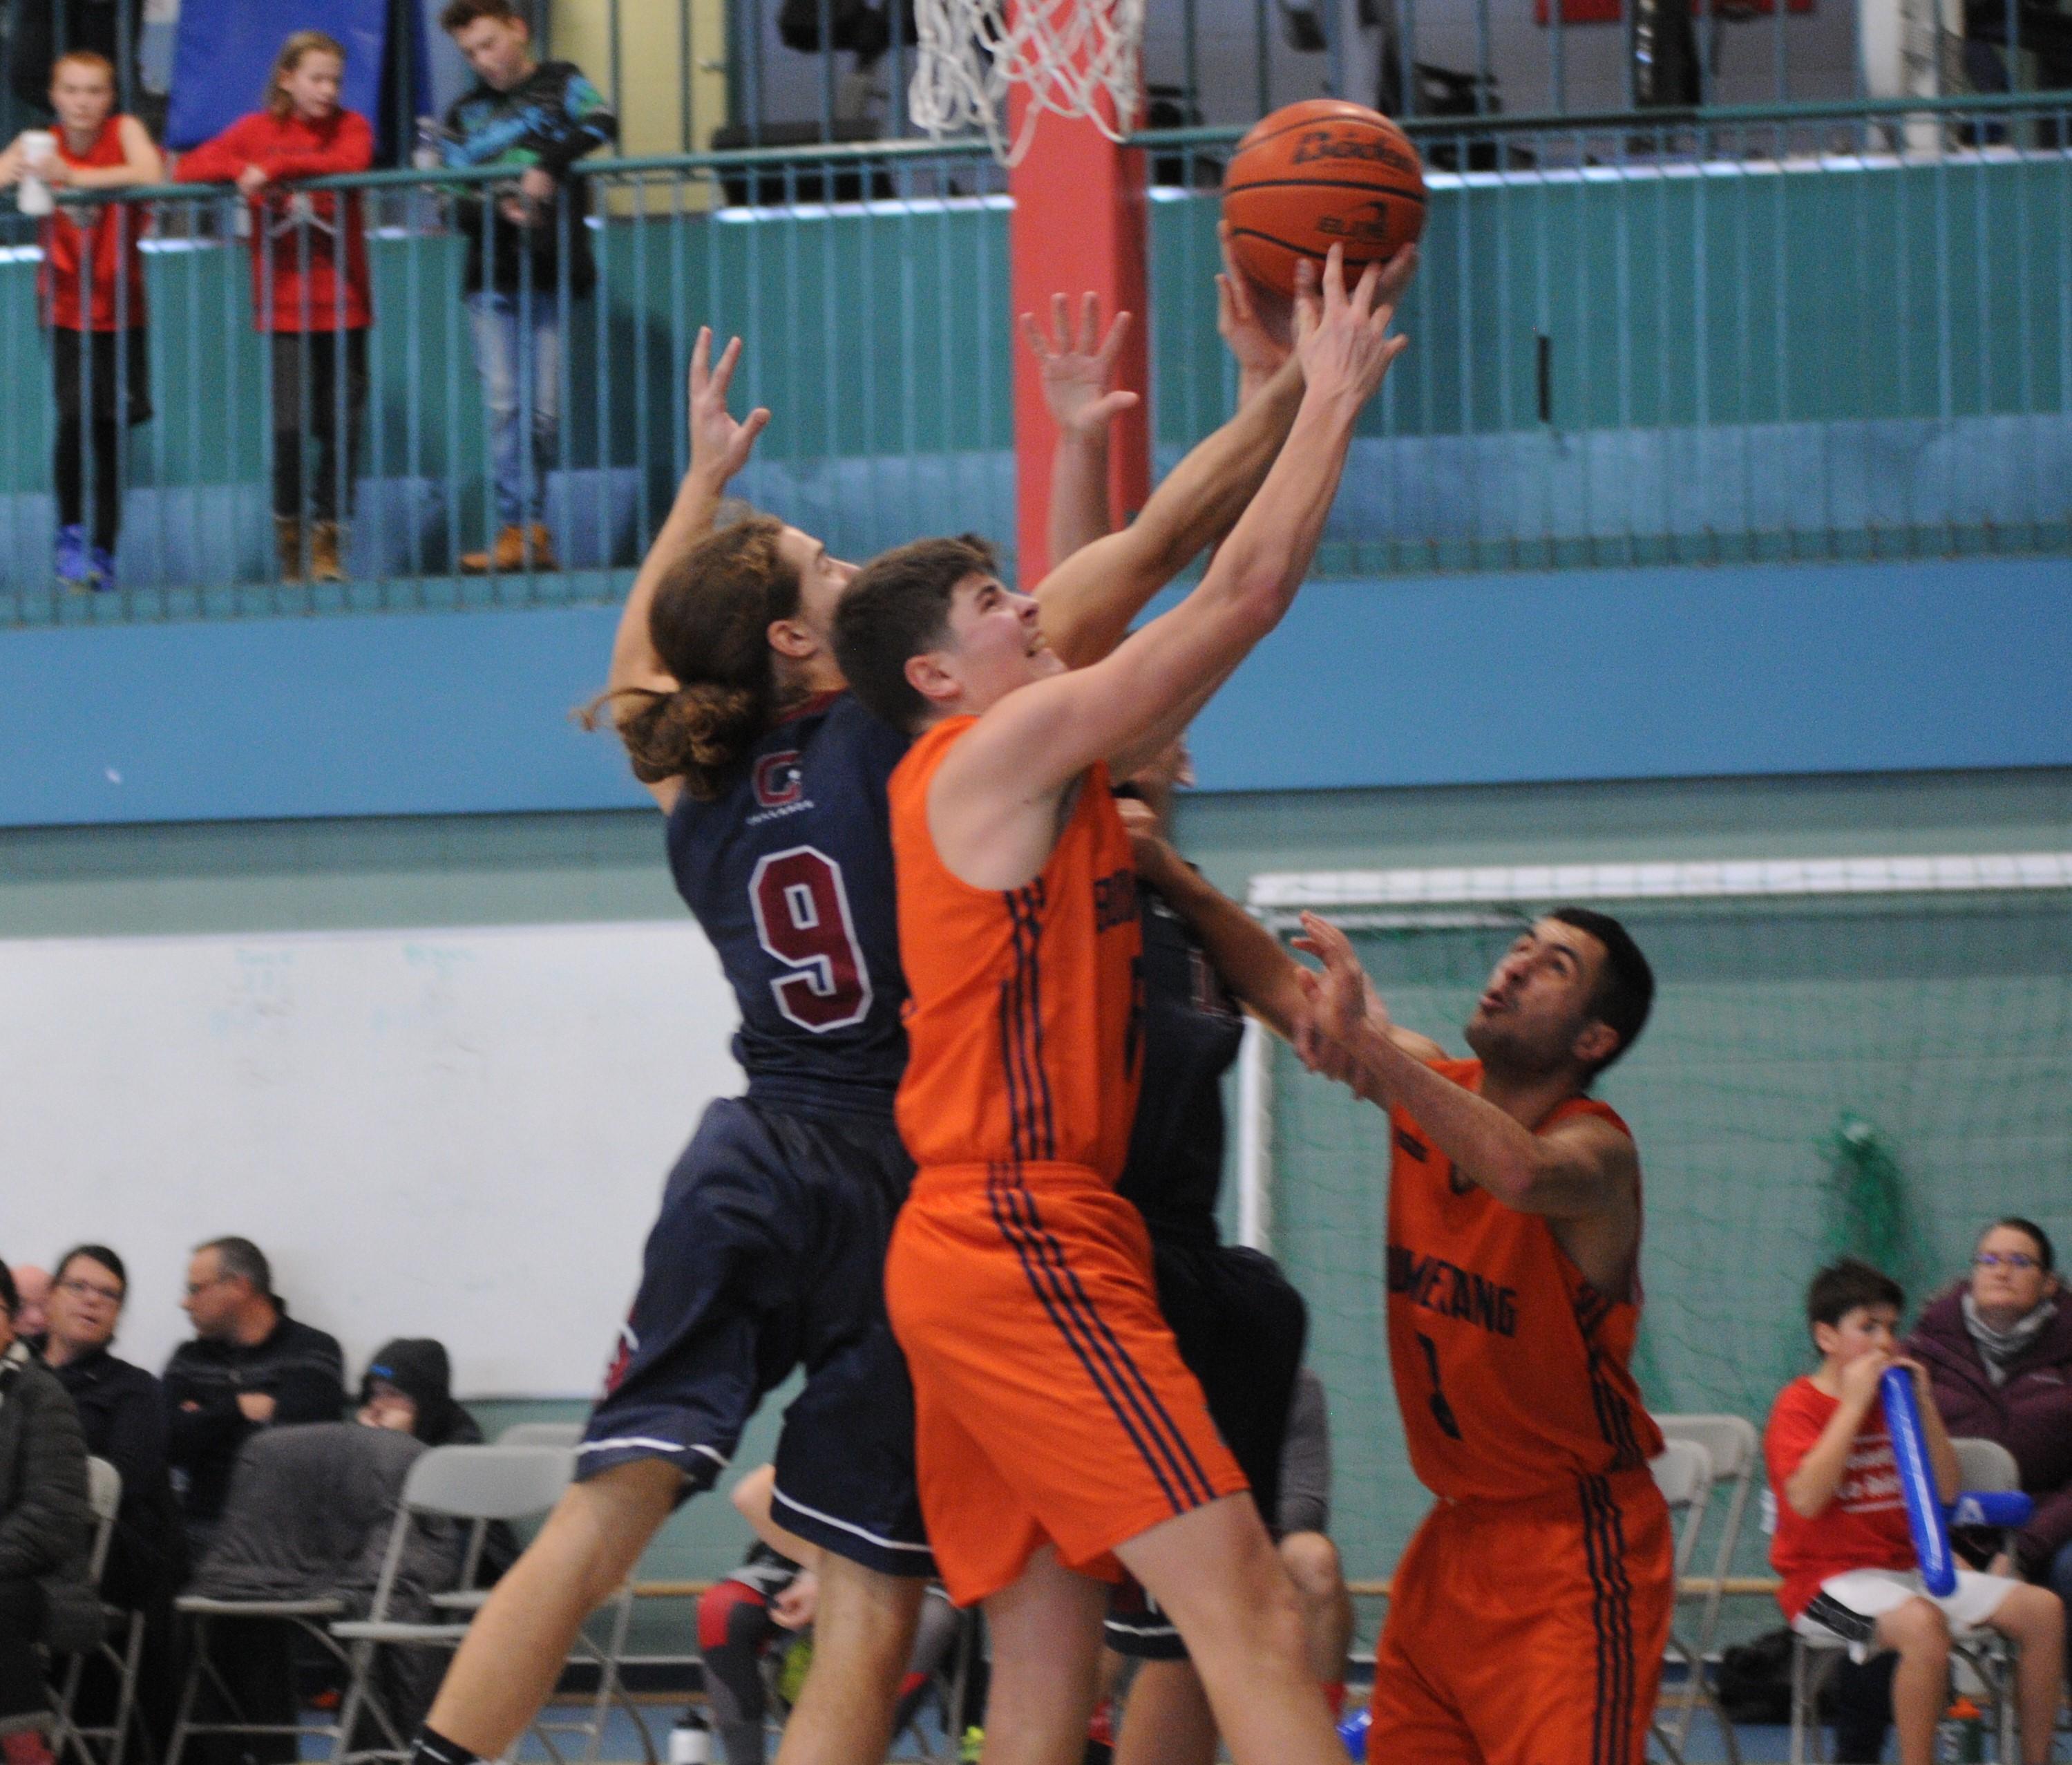 Basketball - Gaillards